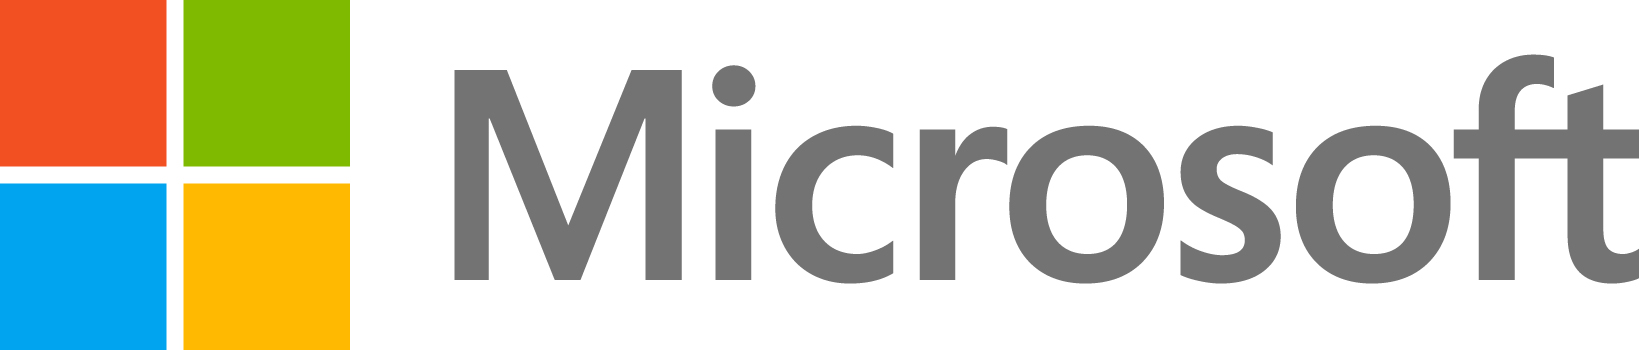 MSFT Logo Rgb C Gray D